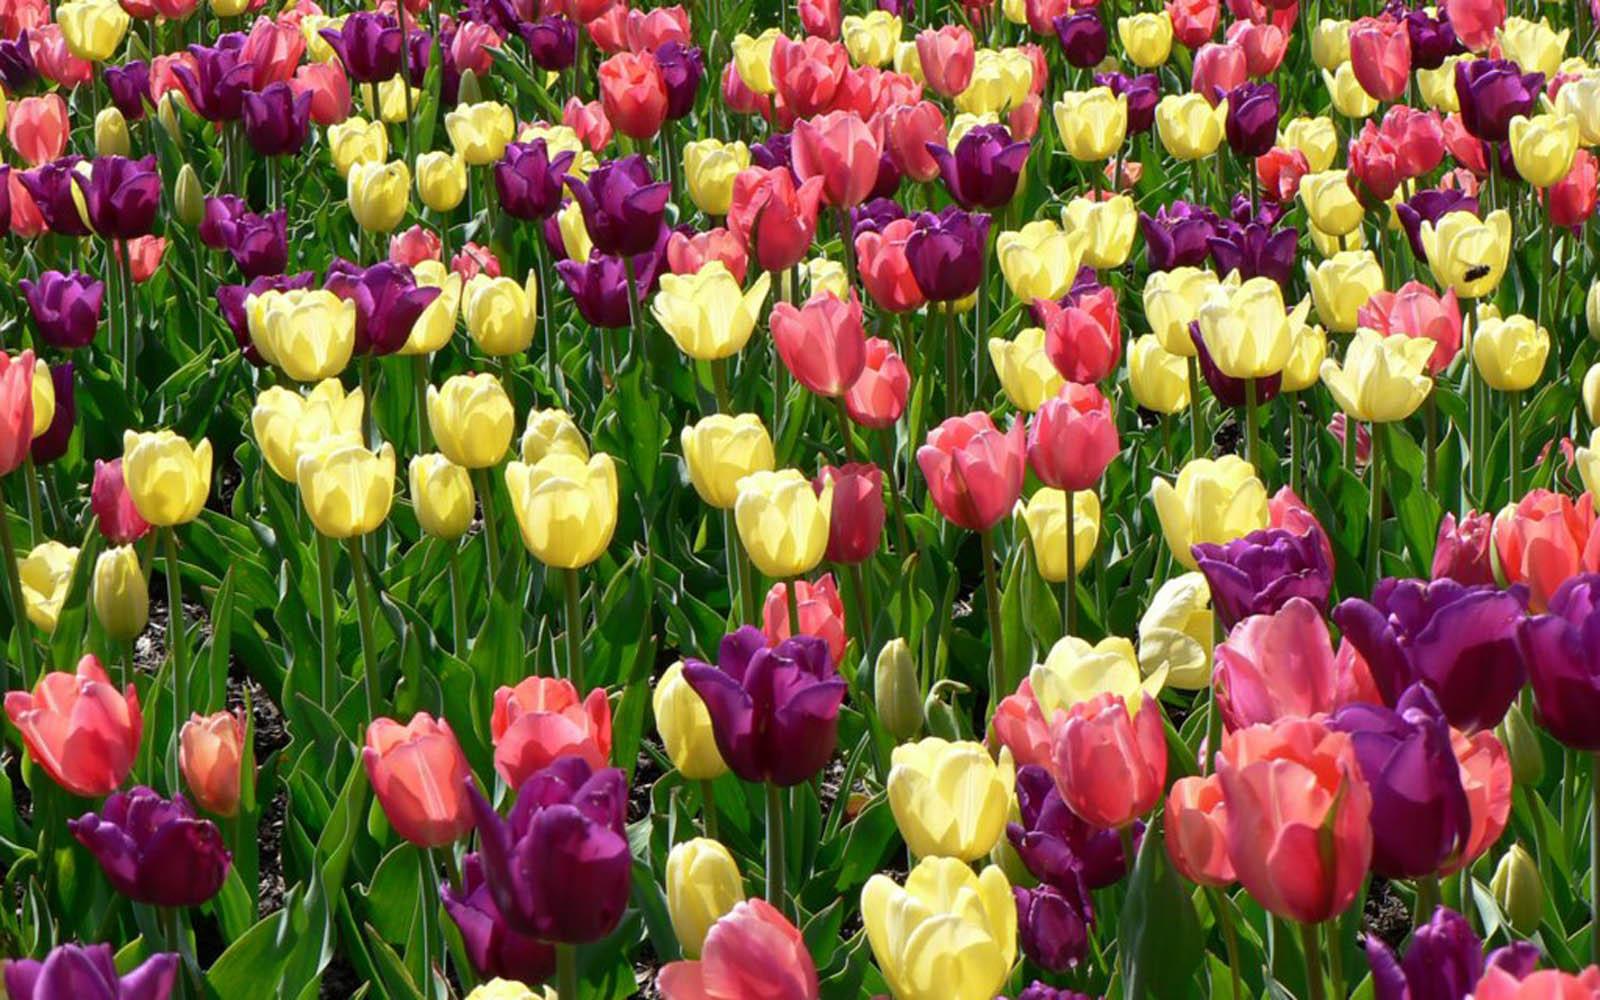 Springtime Flowers Wallpaper.